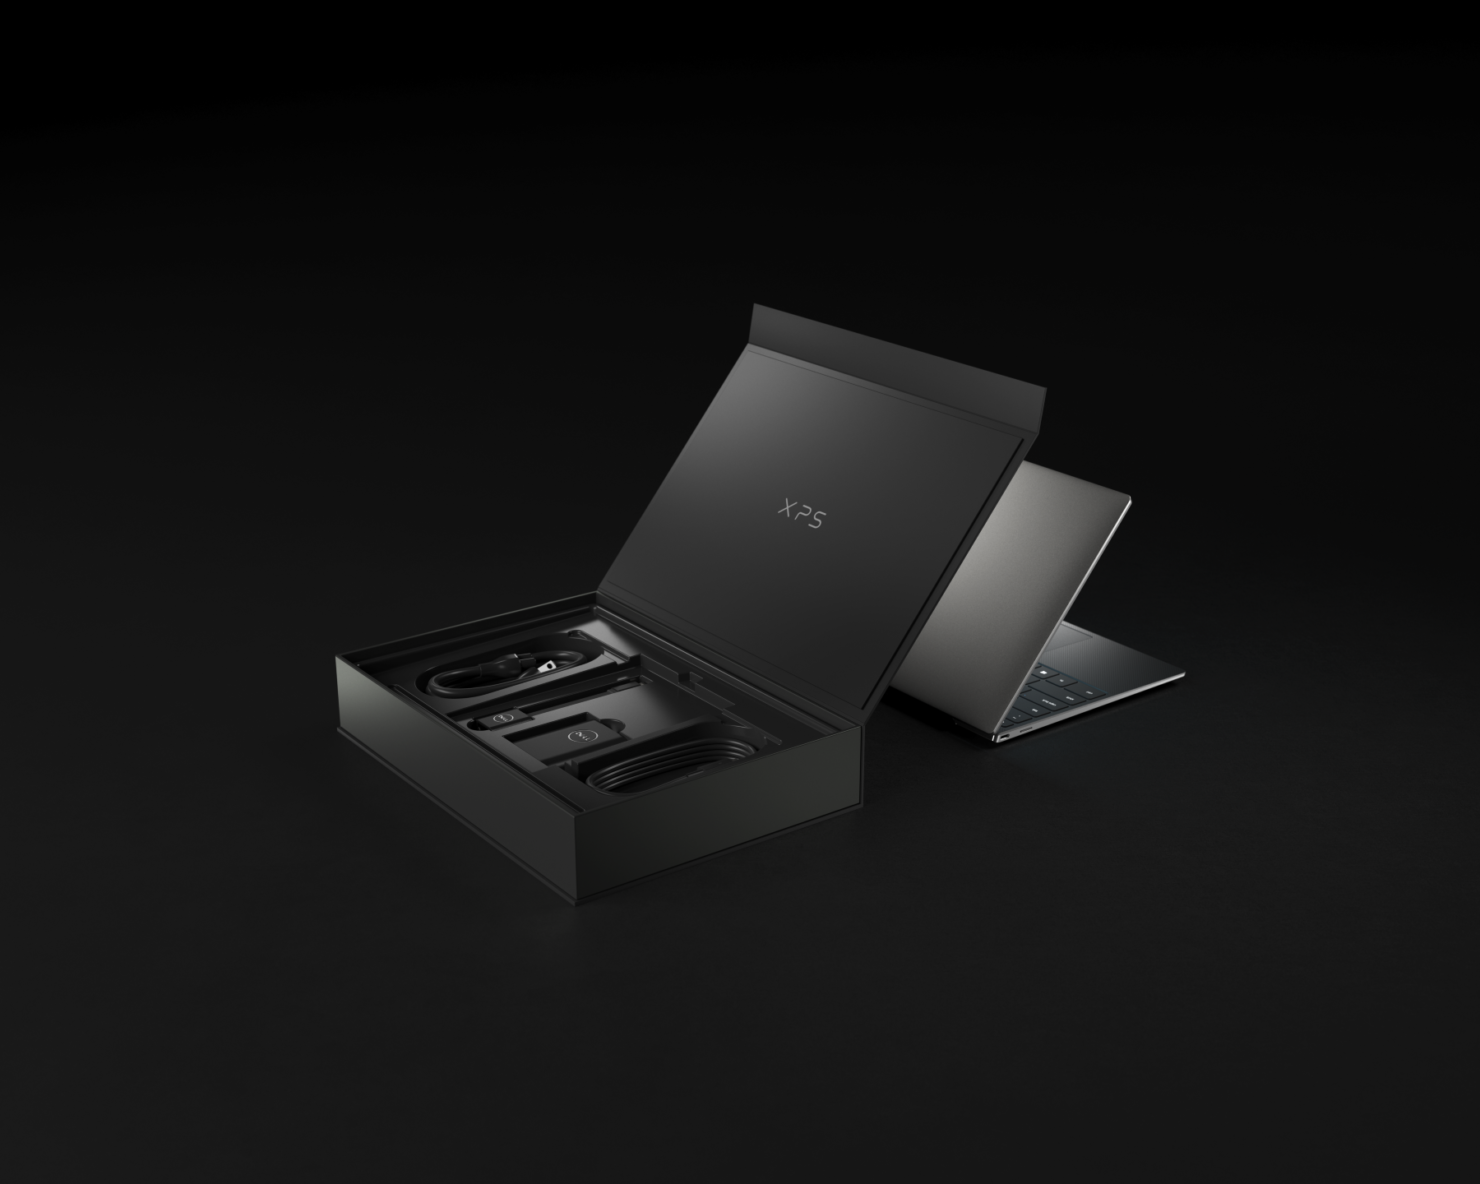 xps_13-unboxed-background-2-custom